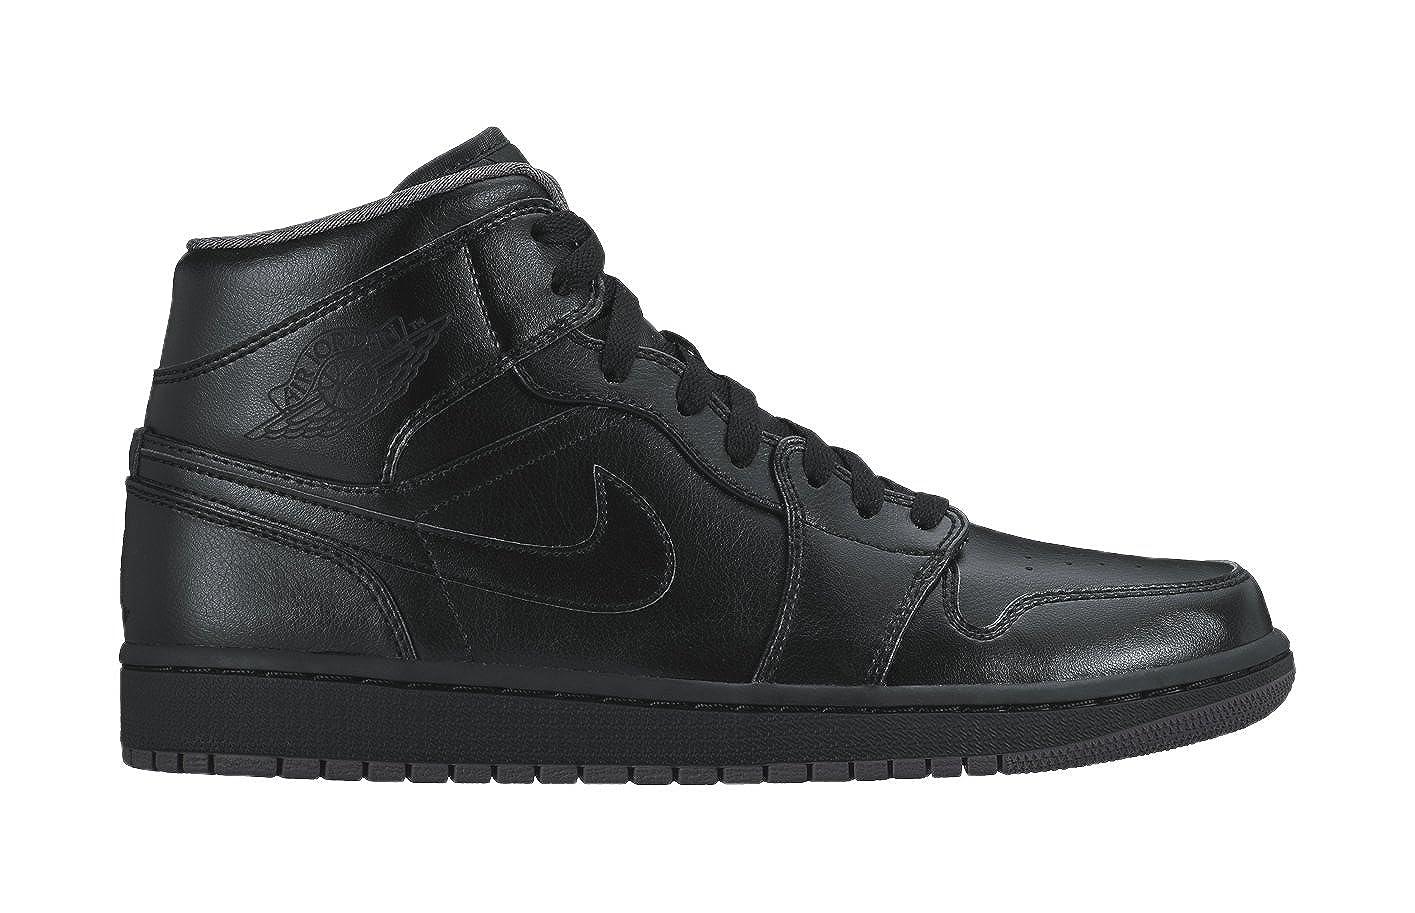 brand new 5858f 12692 Amazon.com   Nike Men s Air Jordan 1 Mid Black Black Dark Grey Basketball  Shoe - 10 D(M) US   Basketball